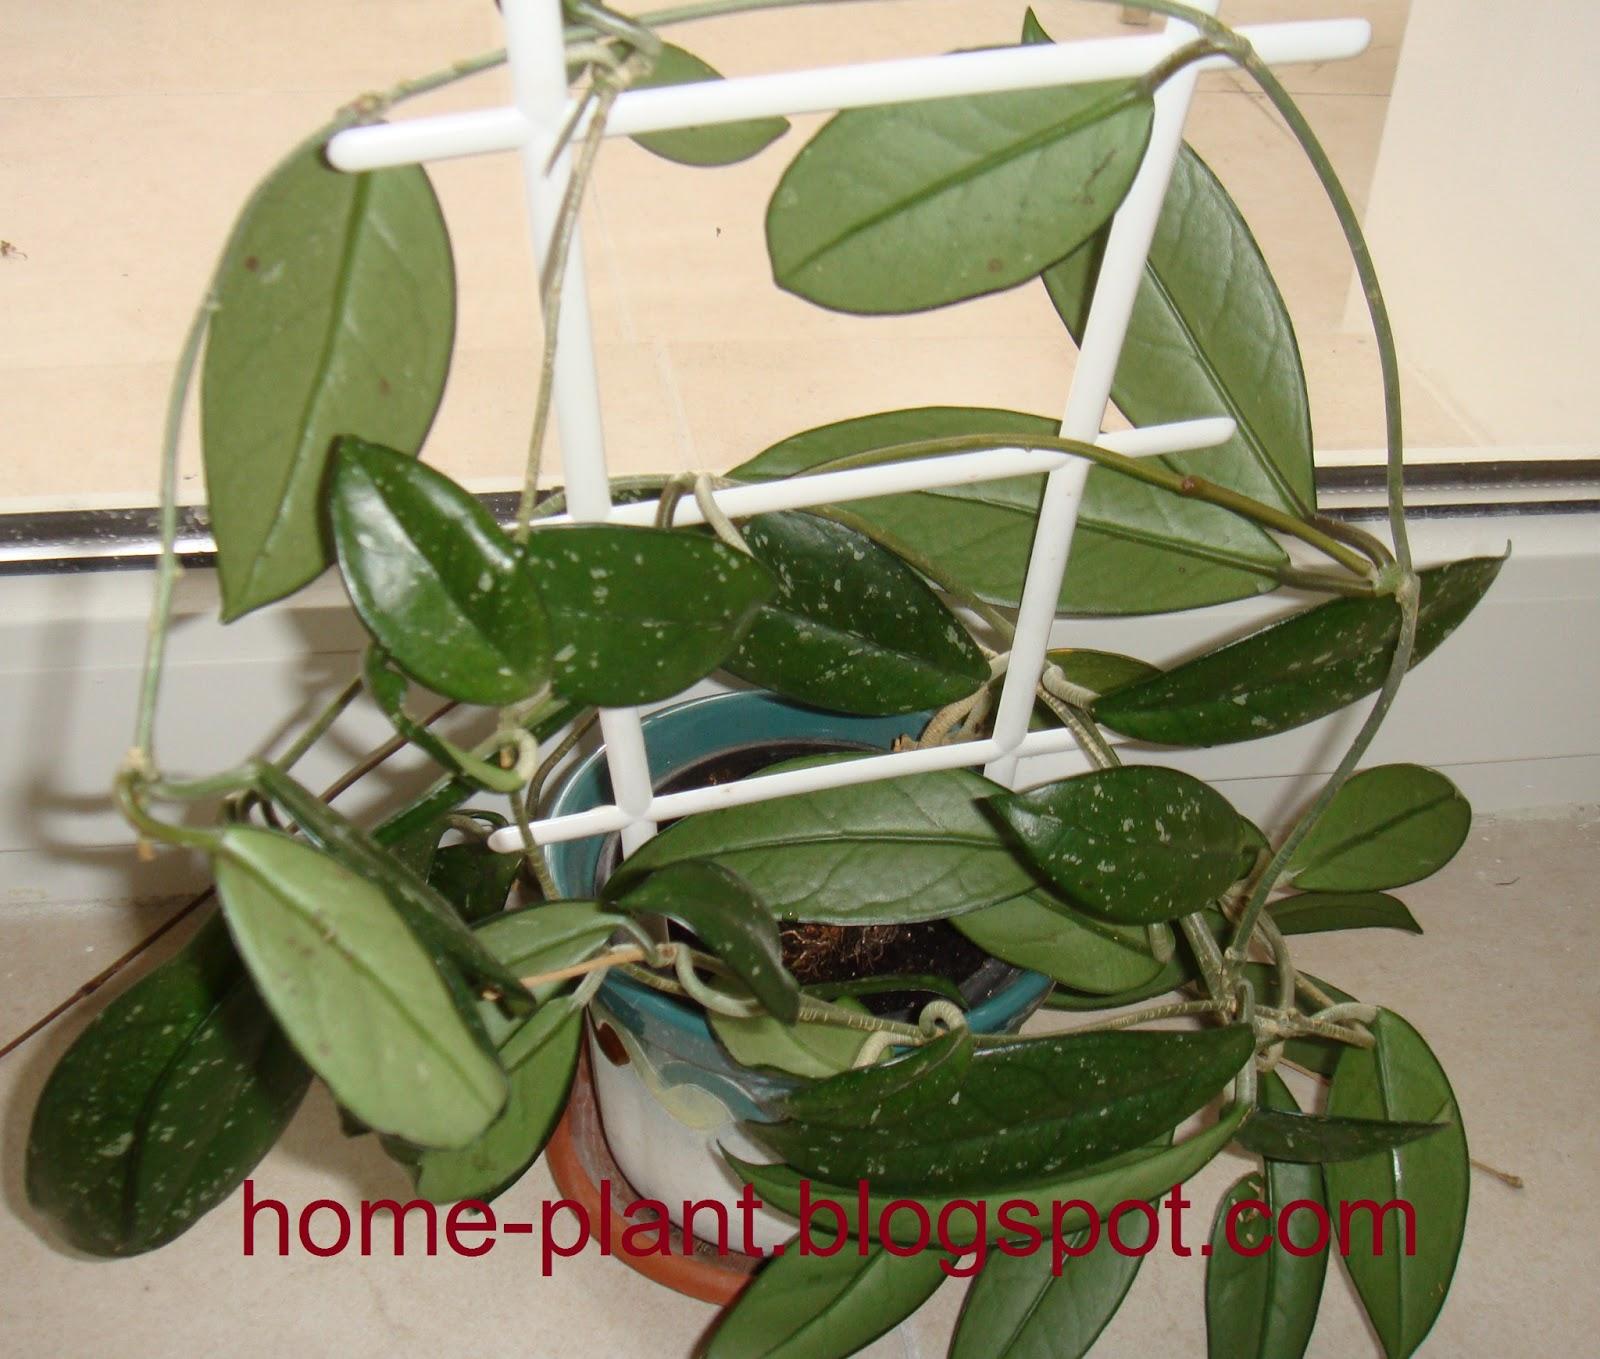 Комнатный цветок хойя уход в домашних условиях фото